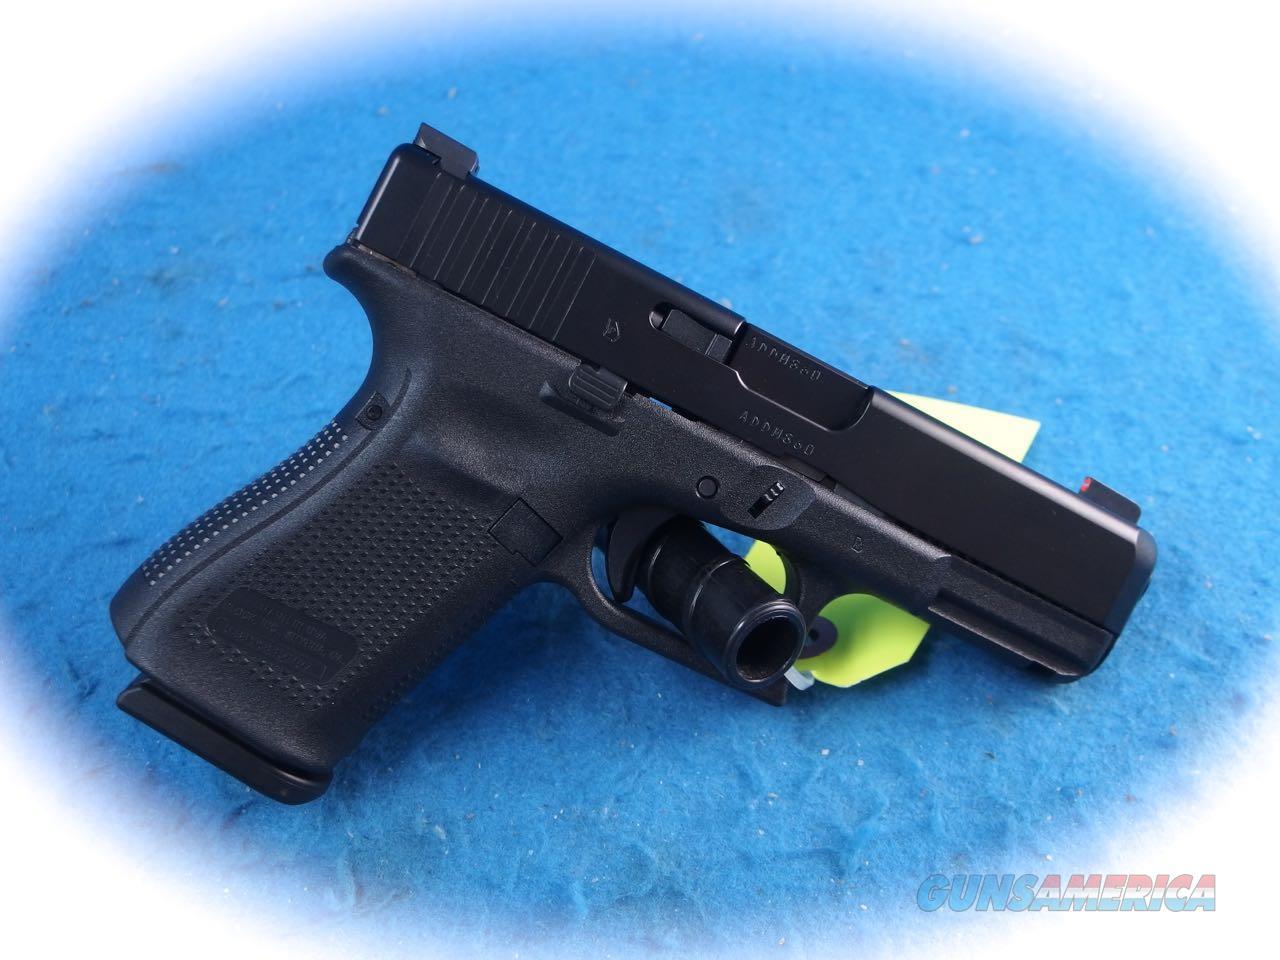 Glock 19 Gen 5 9mm Pistol W/Ameriglo Night Sights **New**  Guns > Pistols > Glock Pistols > 19